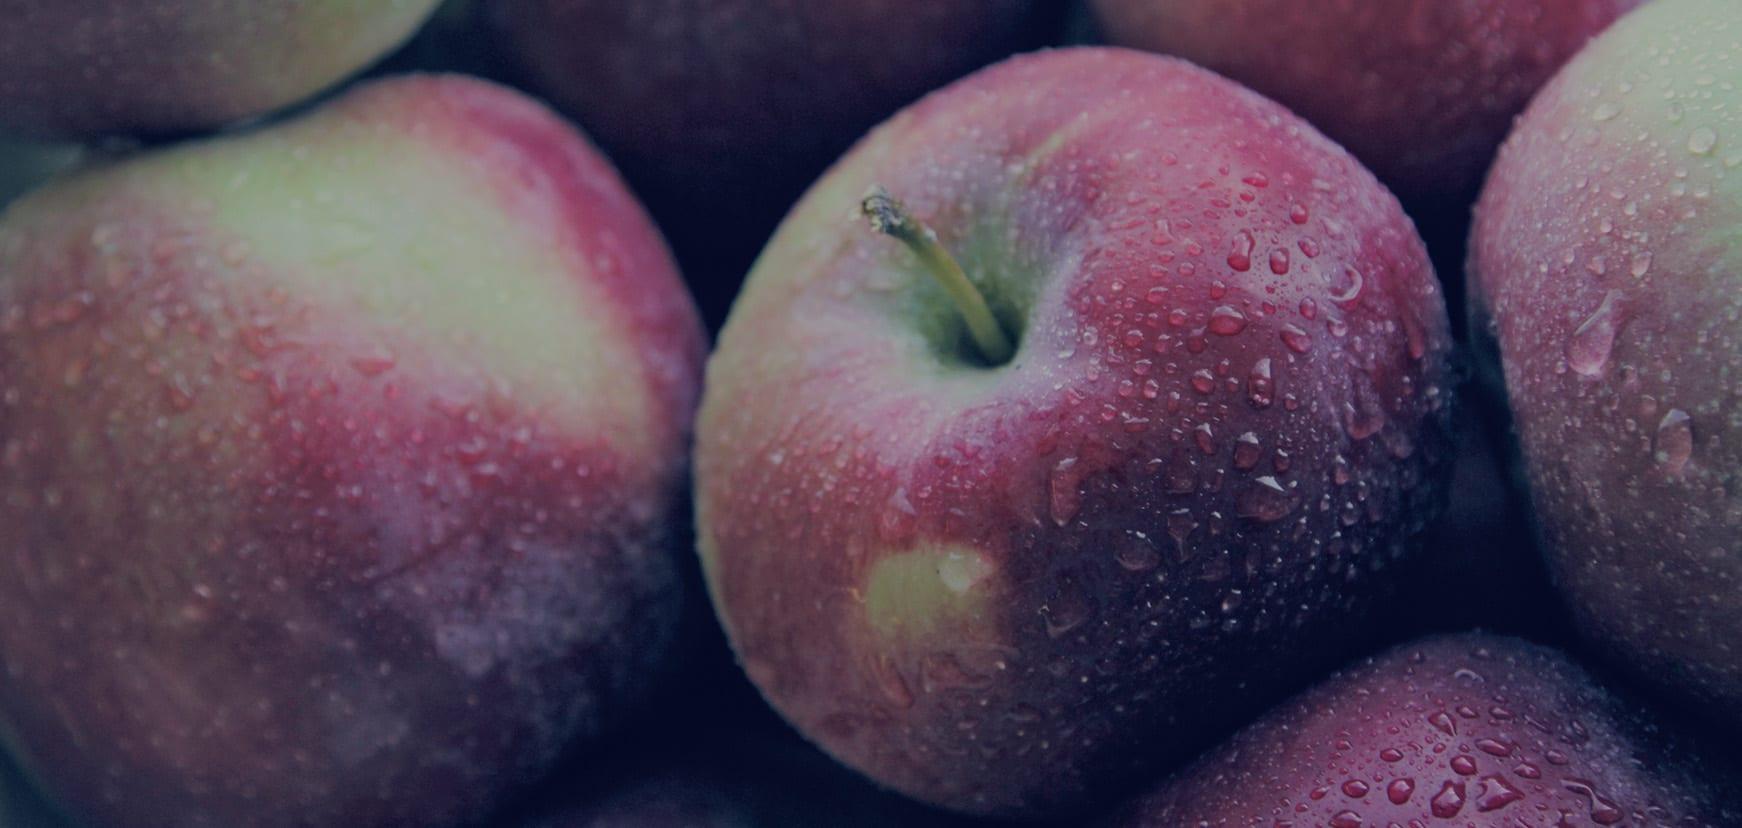 Altländer Äpfel mit Morgentau